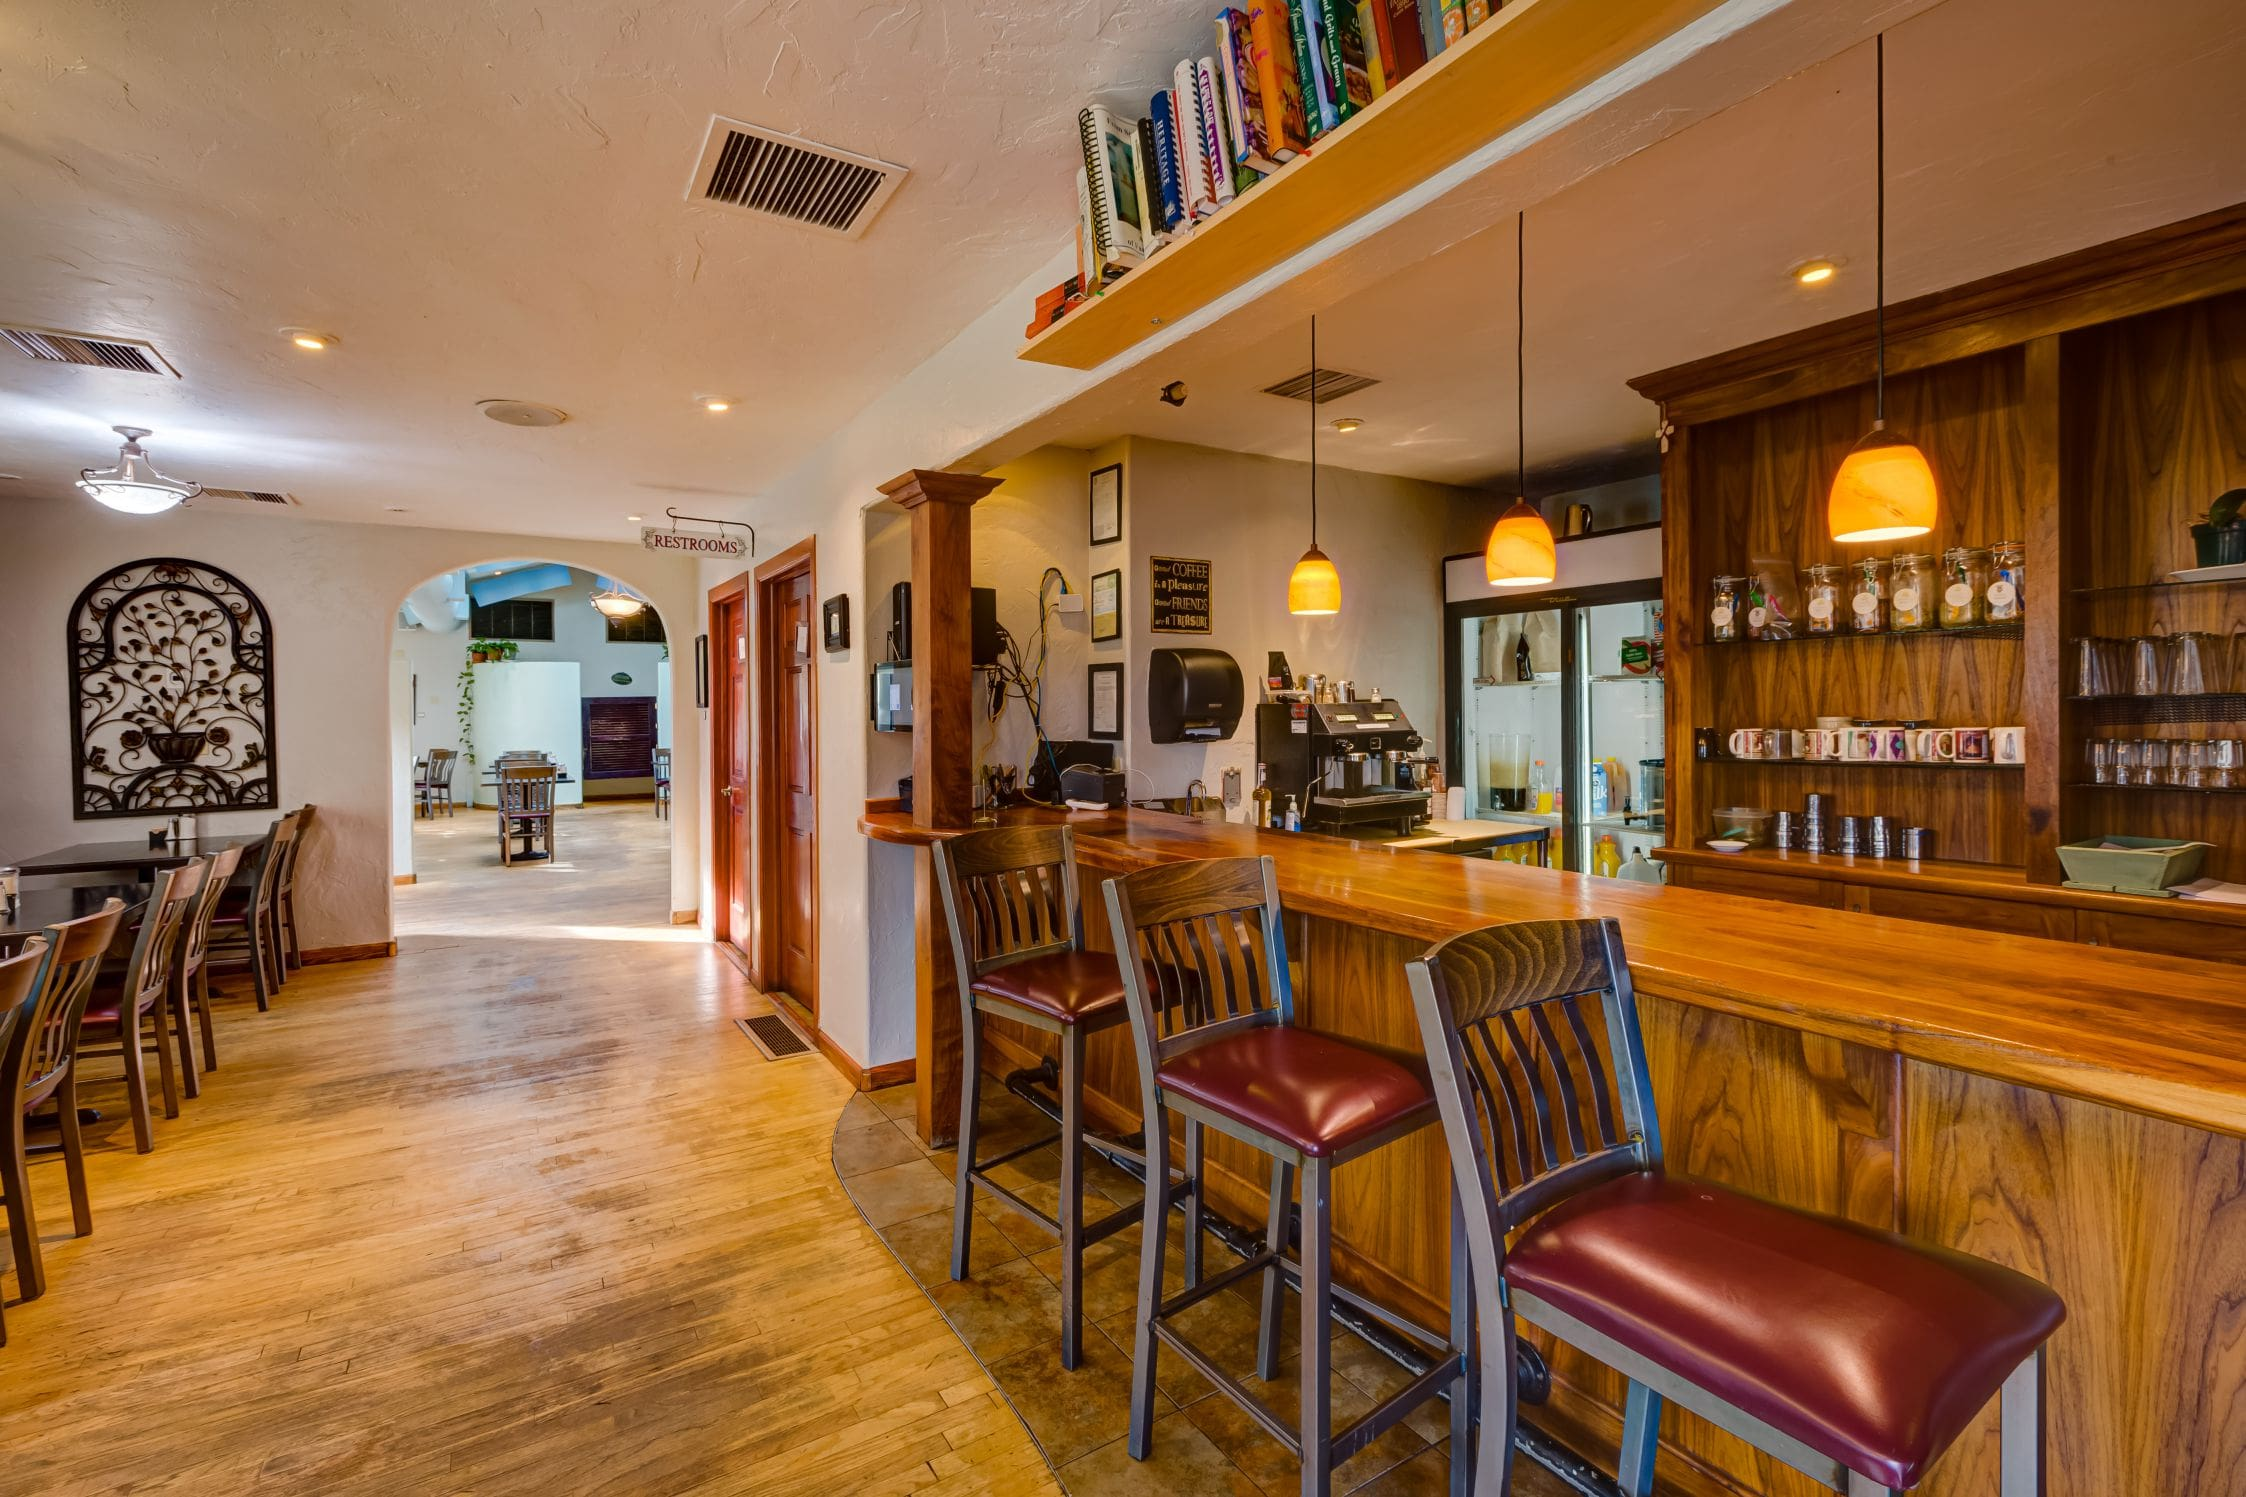 Cozy-Cottage-Restaurant-Denver-0009-min